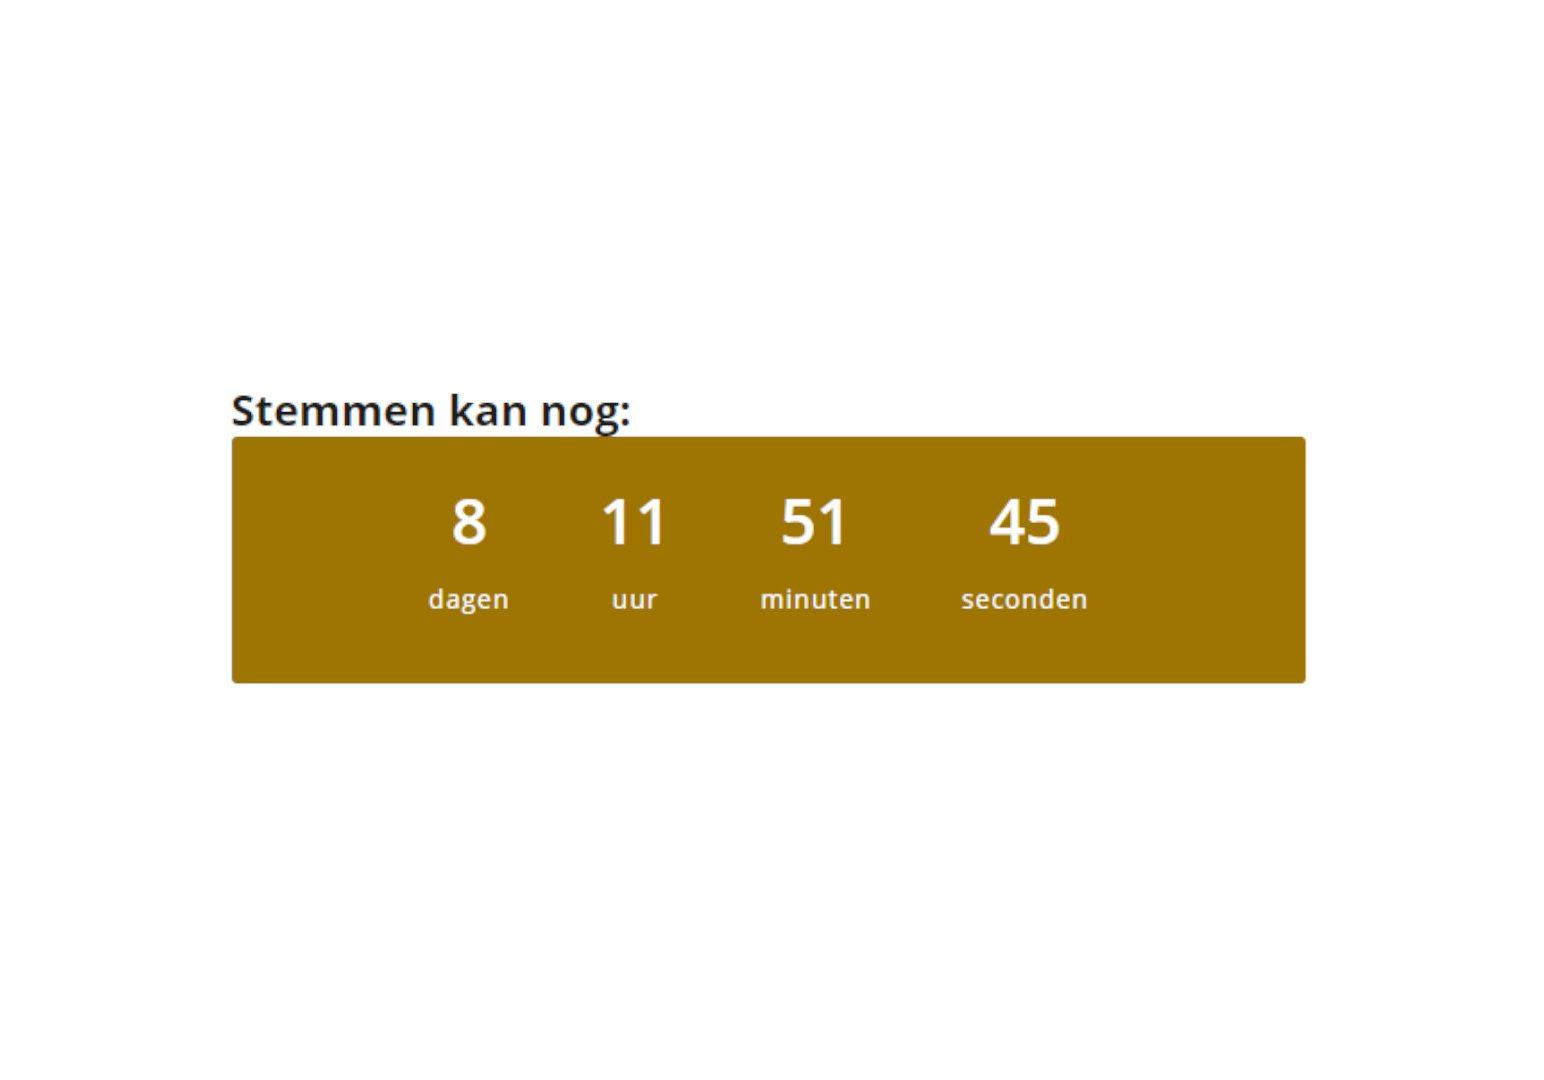 countdownvotecompanysocial